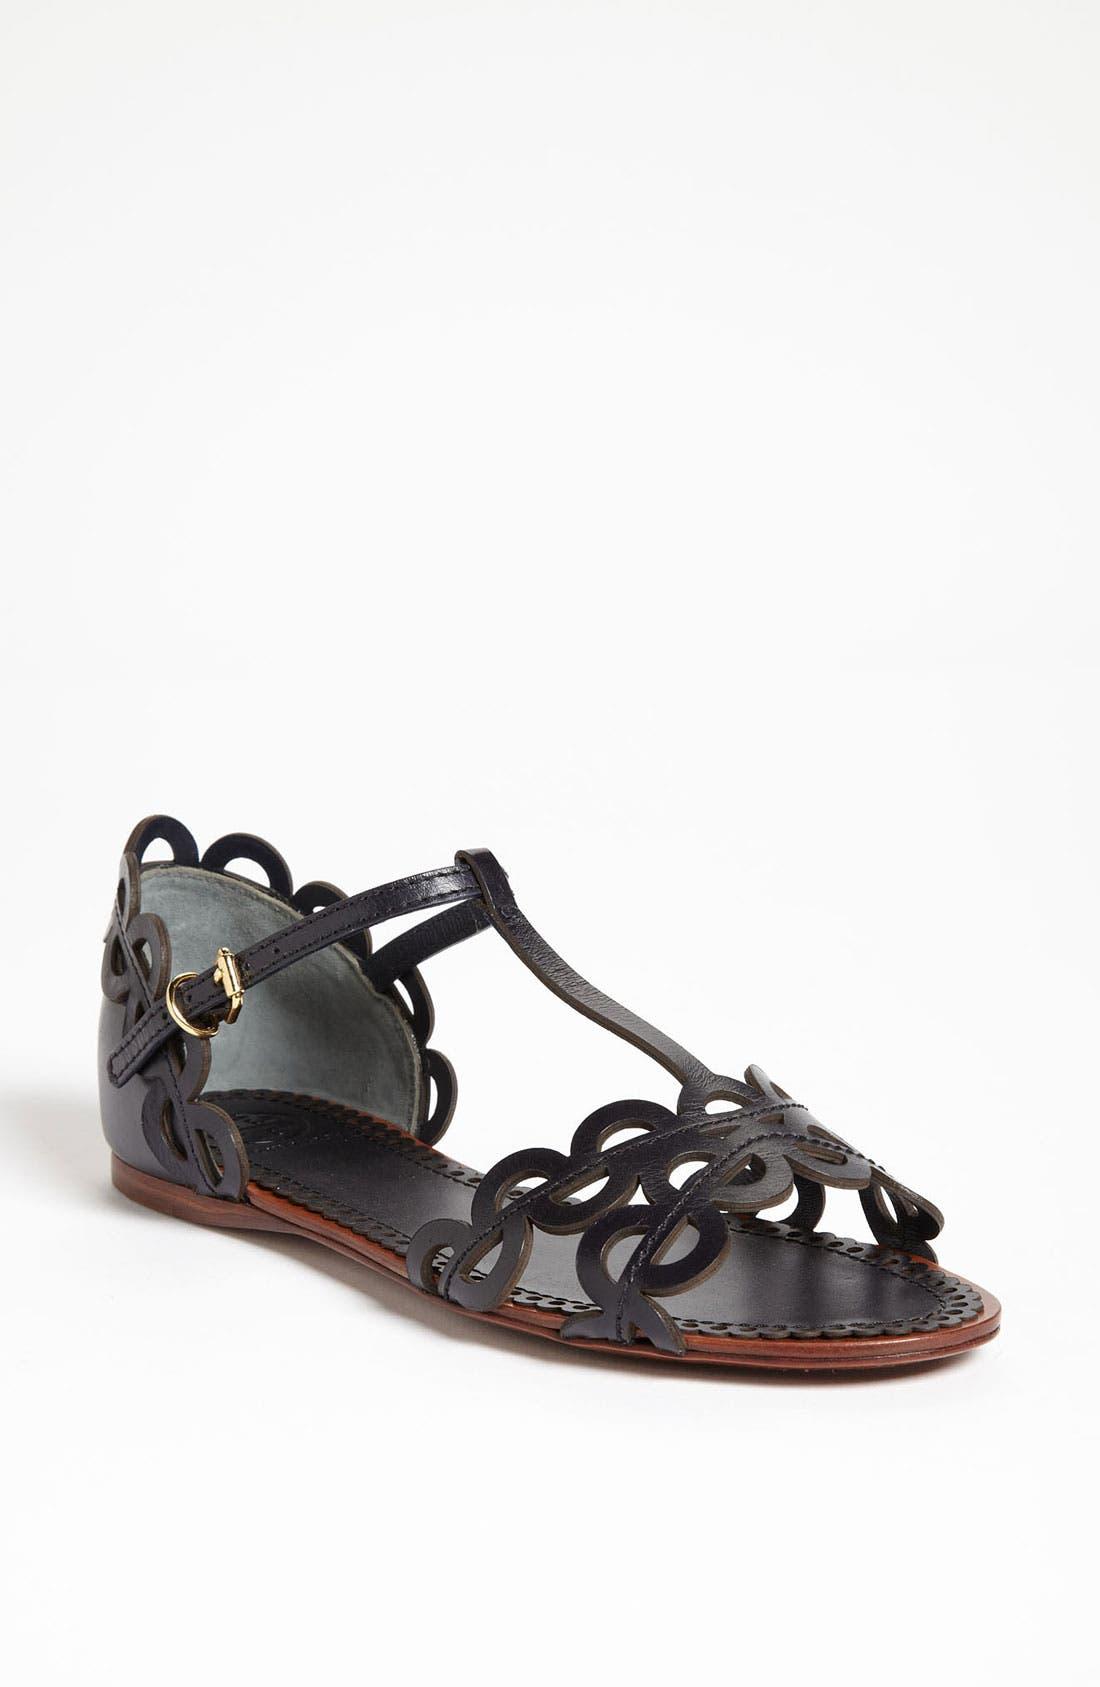 Main Image - Tory Burch 'Aileen' Flat Sandal